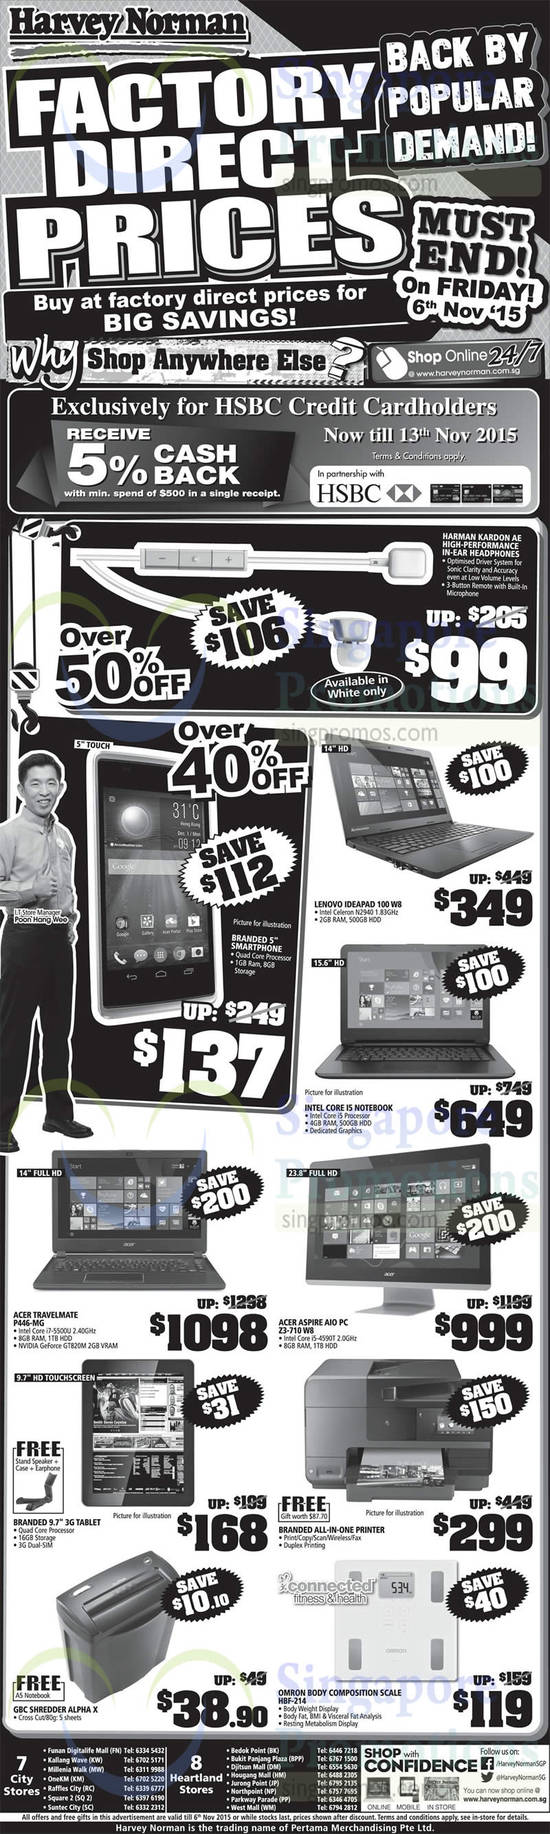 Harman Kardon AE High-Performance Headphones, Lenovo Ideapad 100 W8 Notebook, Acer Travelmate P446-MG Notebook, Acer Aspire Z3-710 W8 AIO Desktop PC, GBC Alpha X Shredder, Omron HBF-214 Body Composition Scale